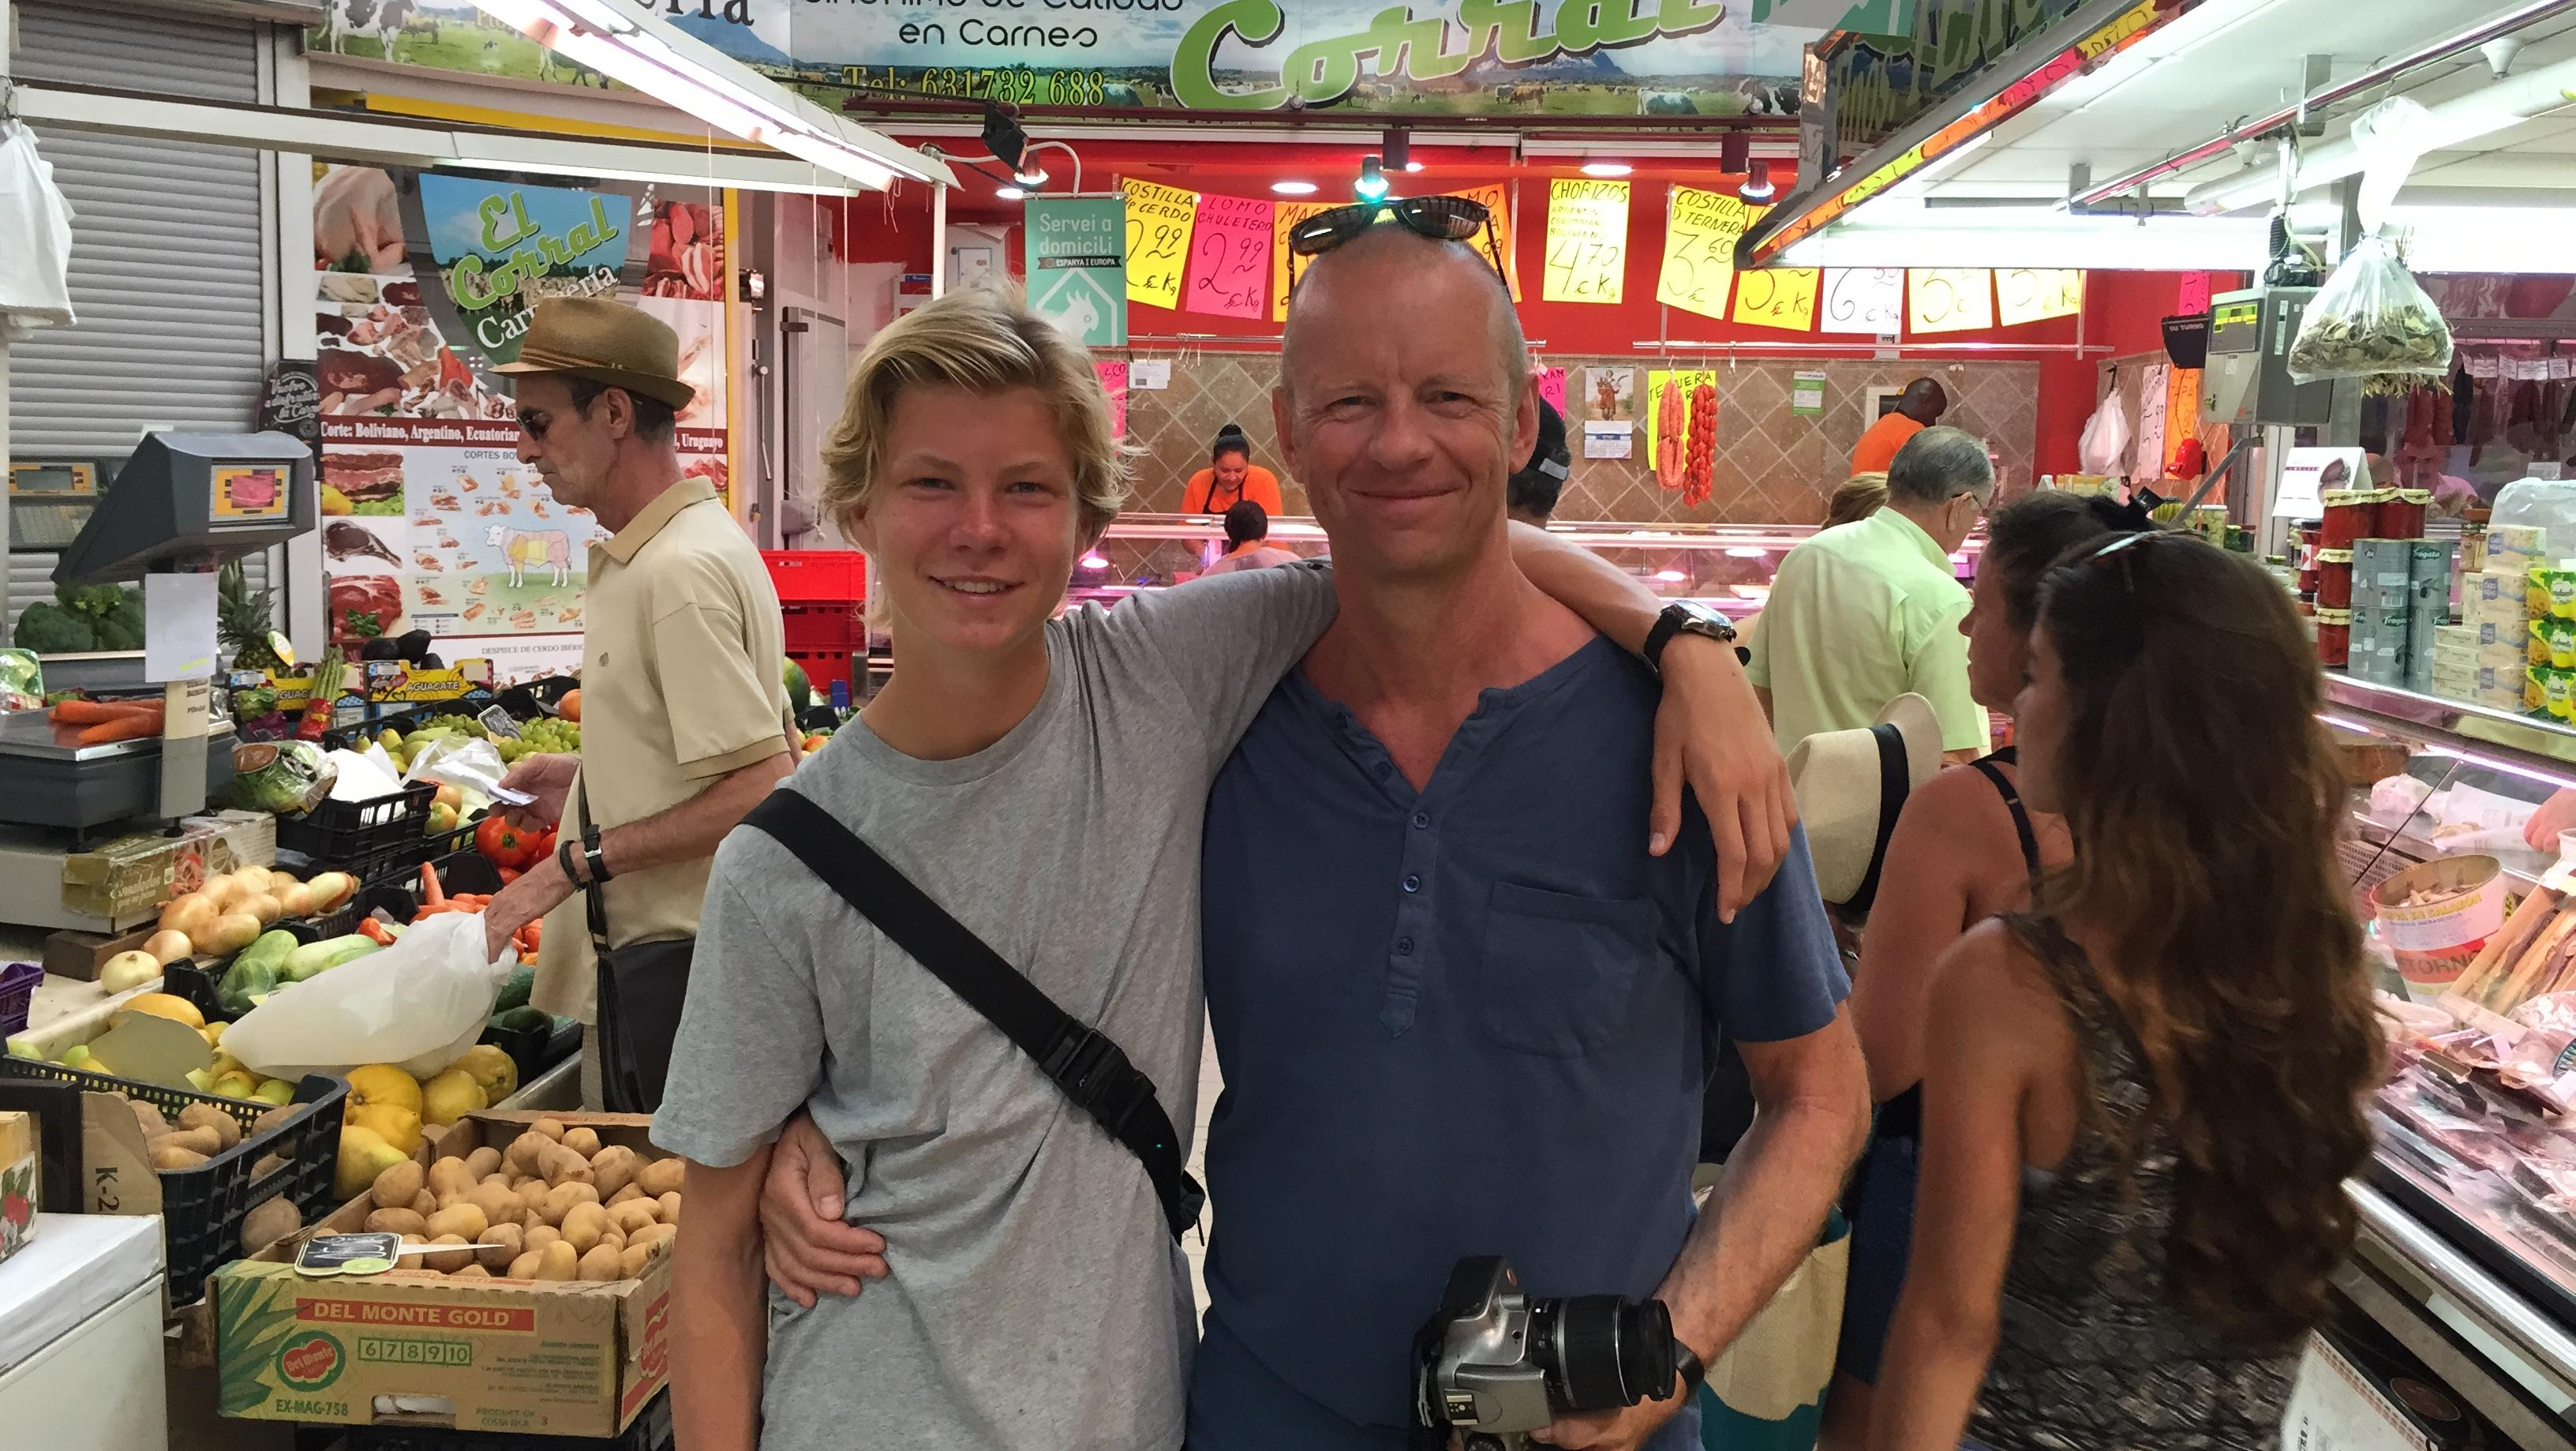 2015.08.06_valencia_mercat_central_mathias_niels_boje_2.jpg